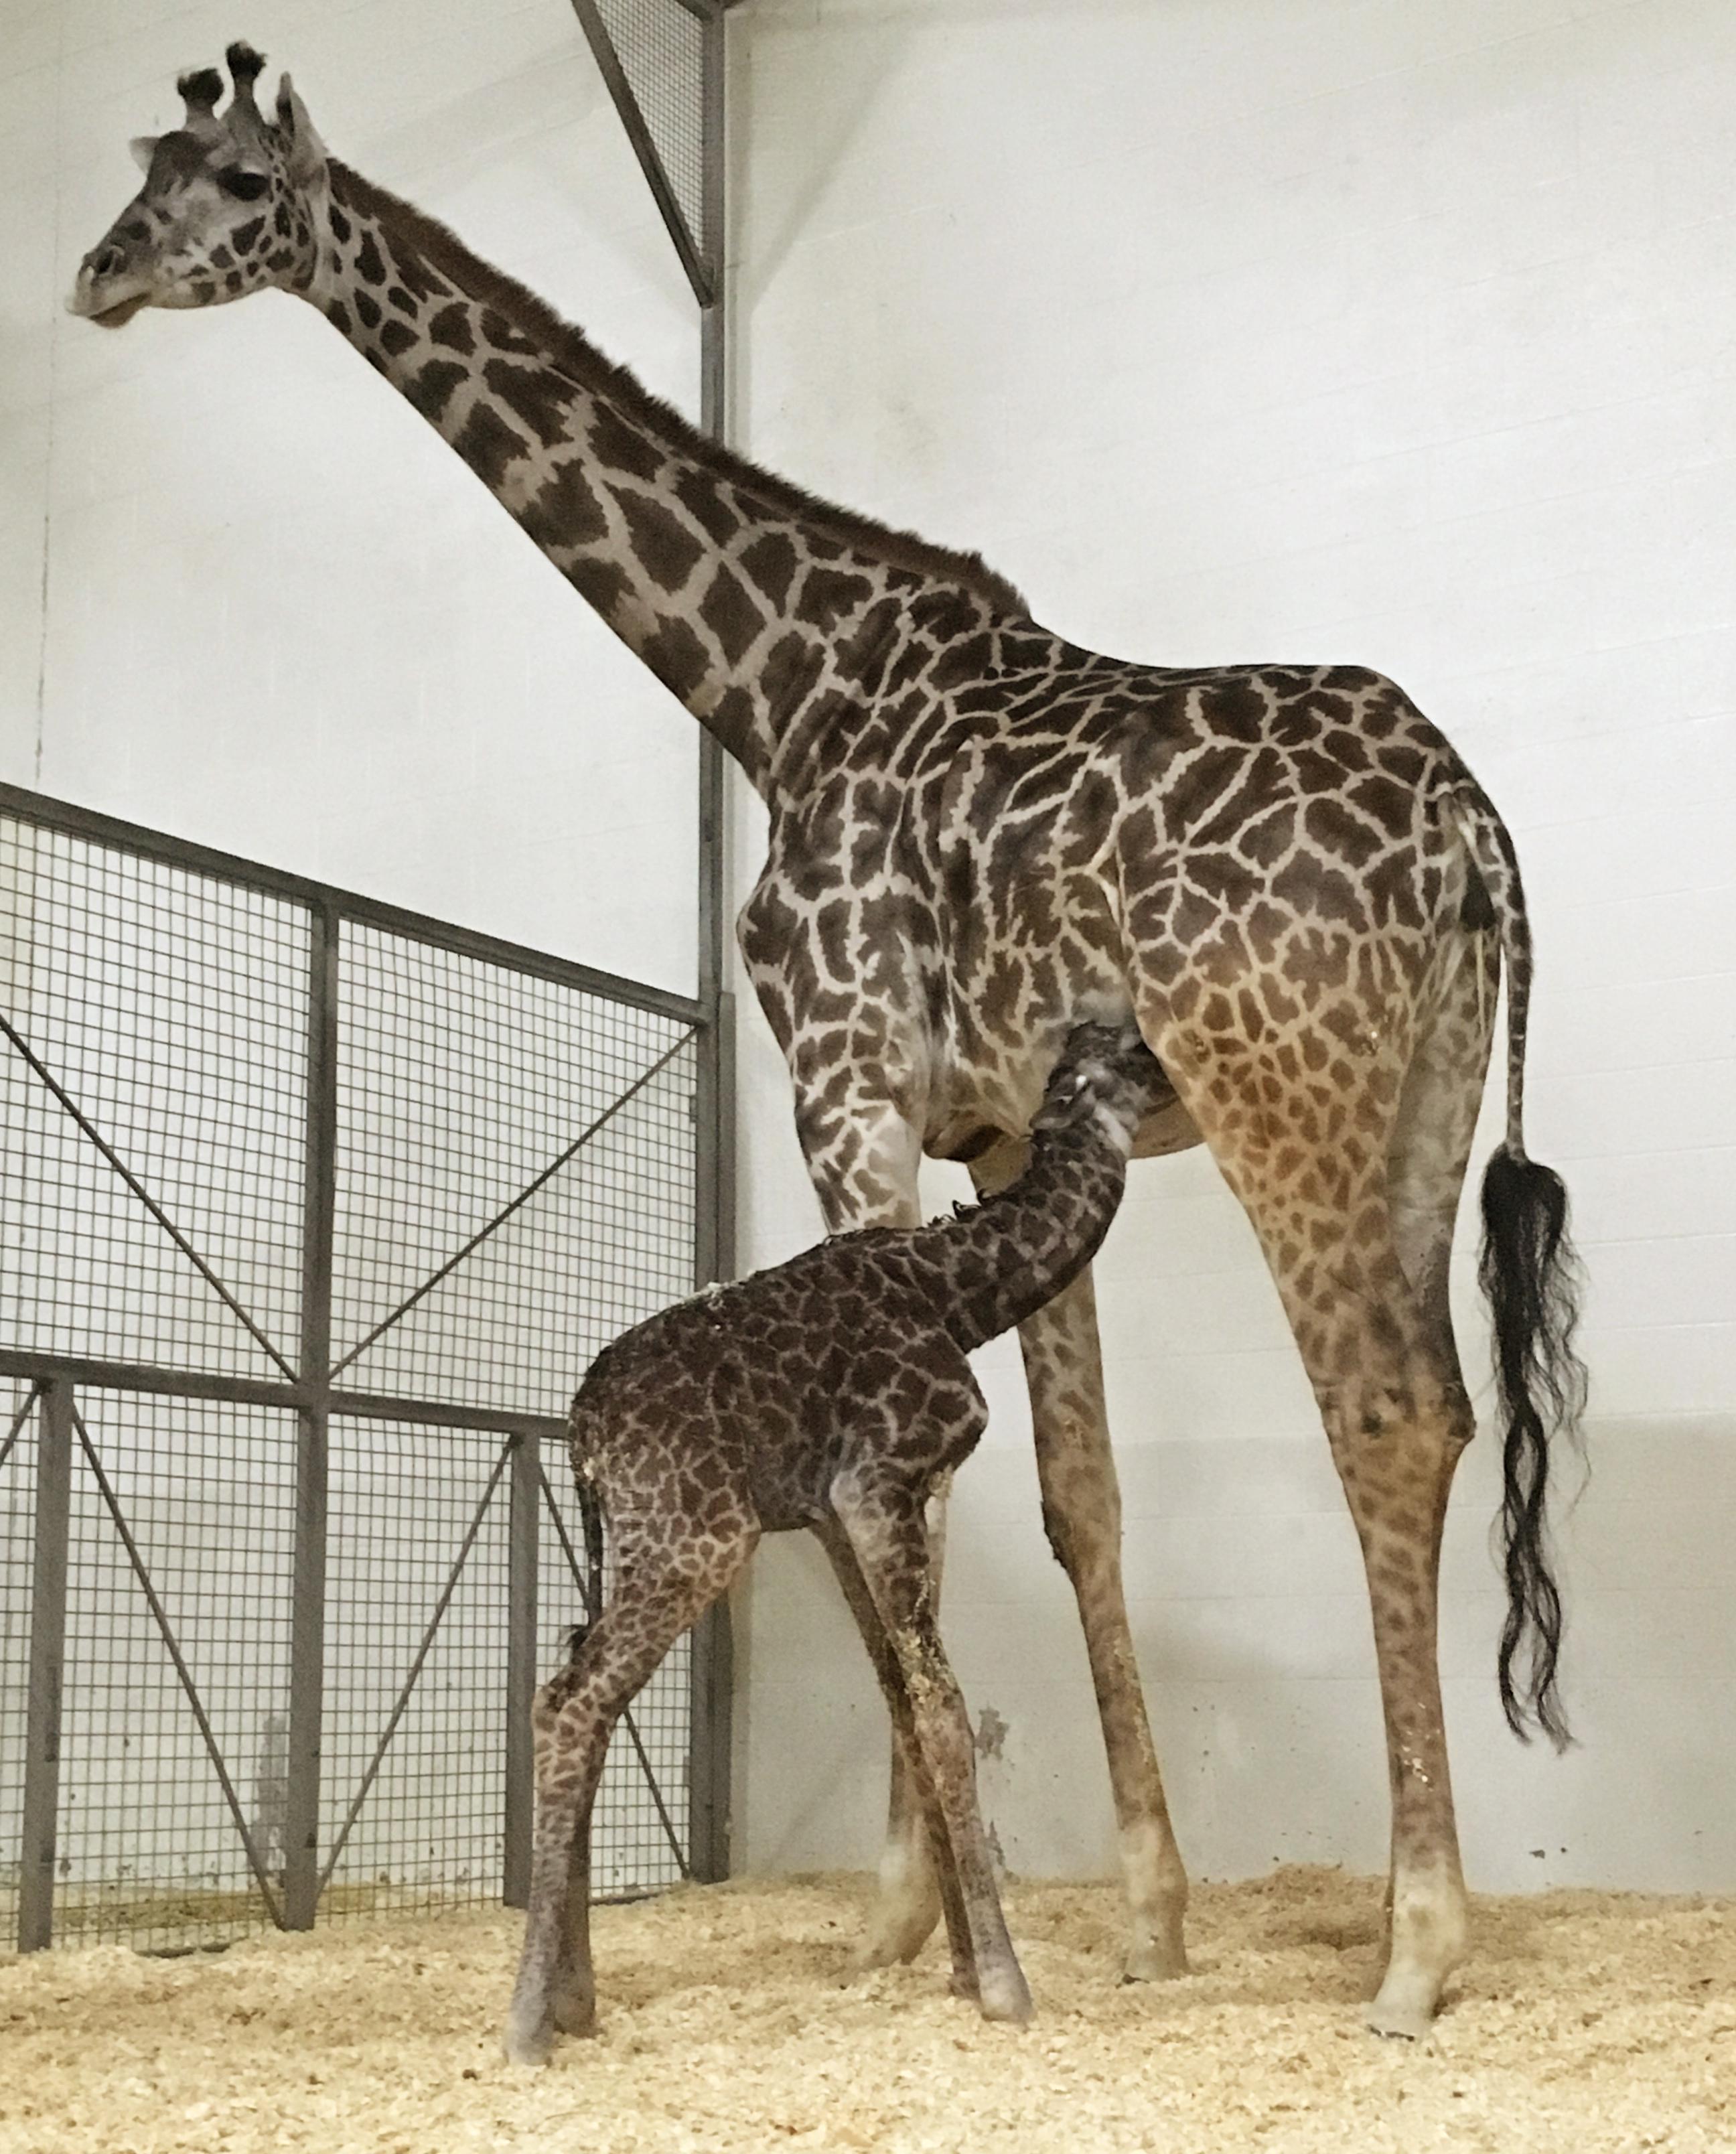 It S Raining Giraffes At The Cincinnati Zoo The